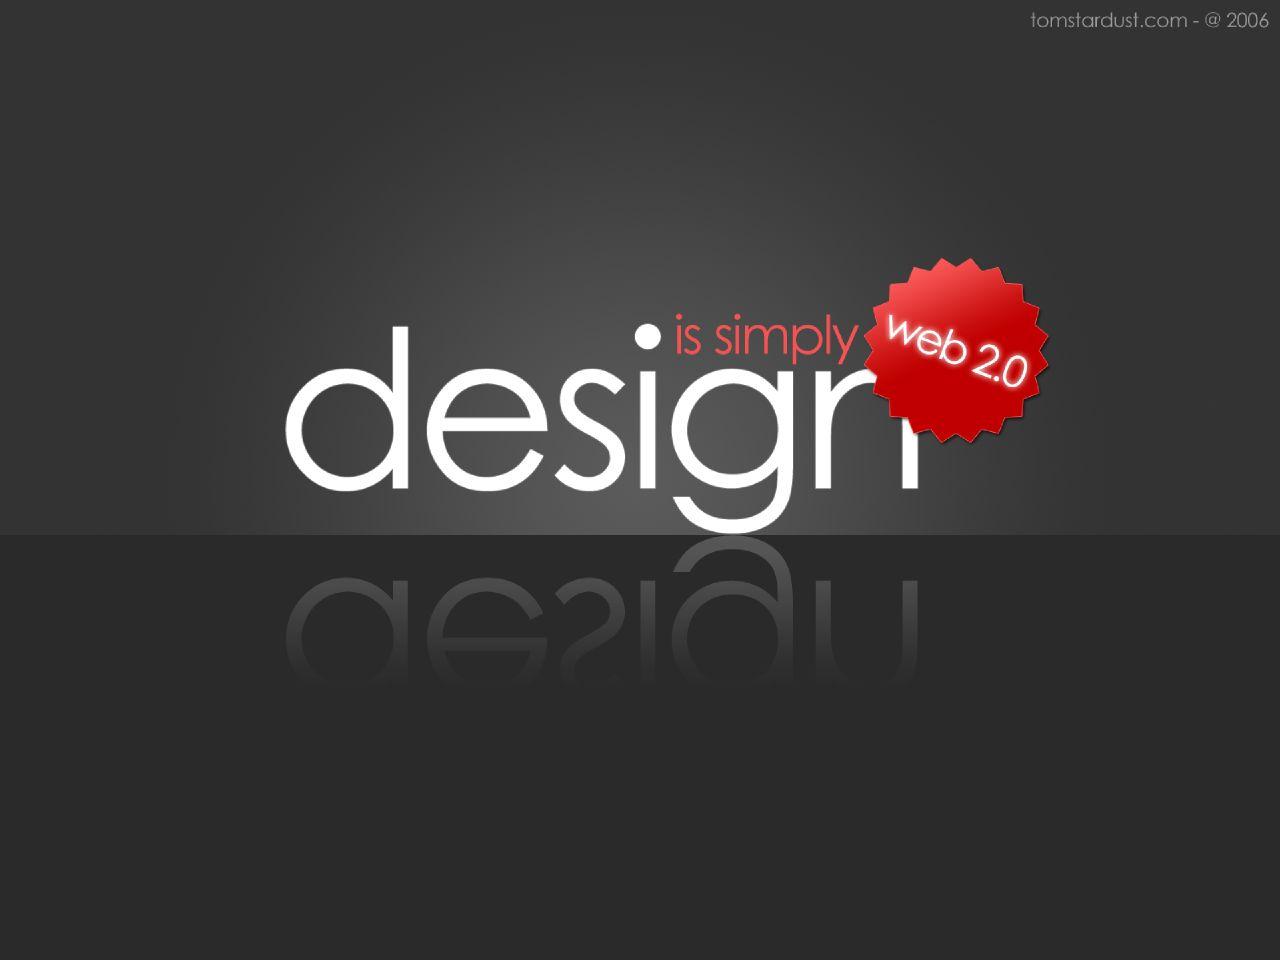 design you a logo and many more